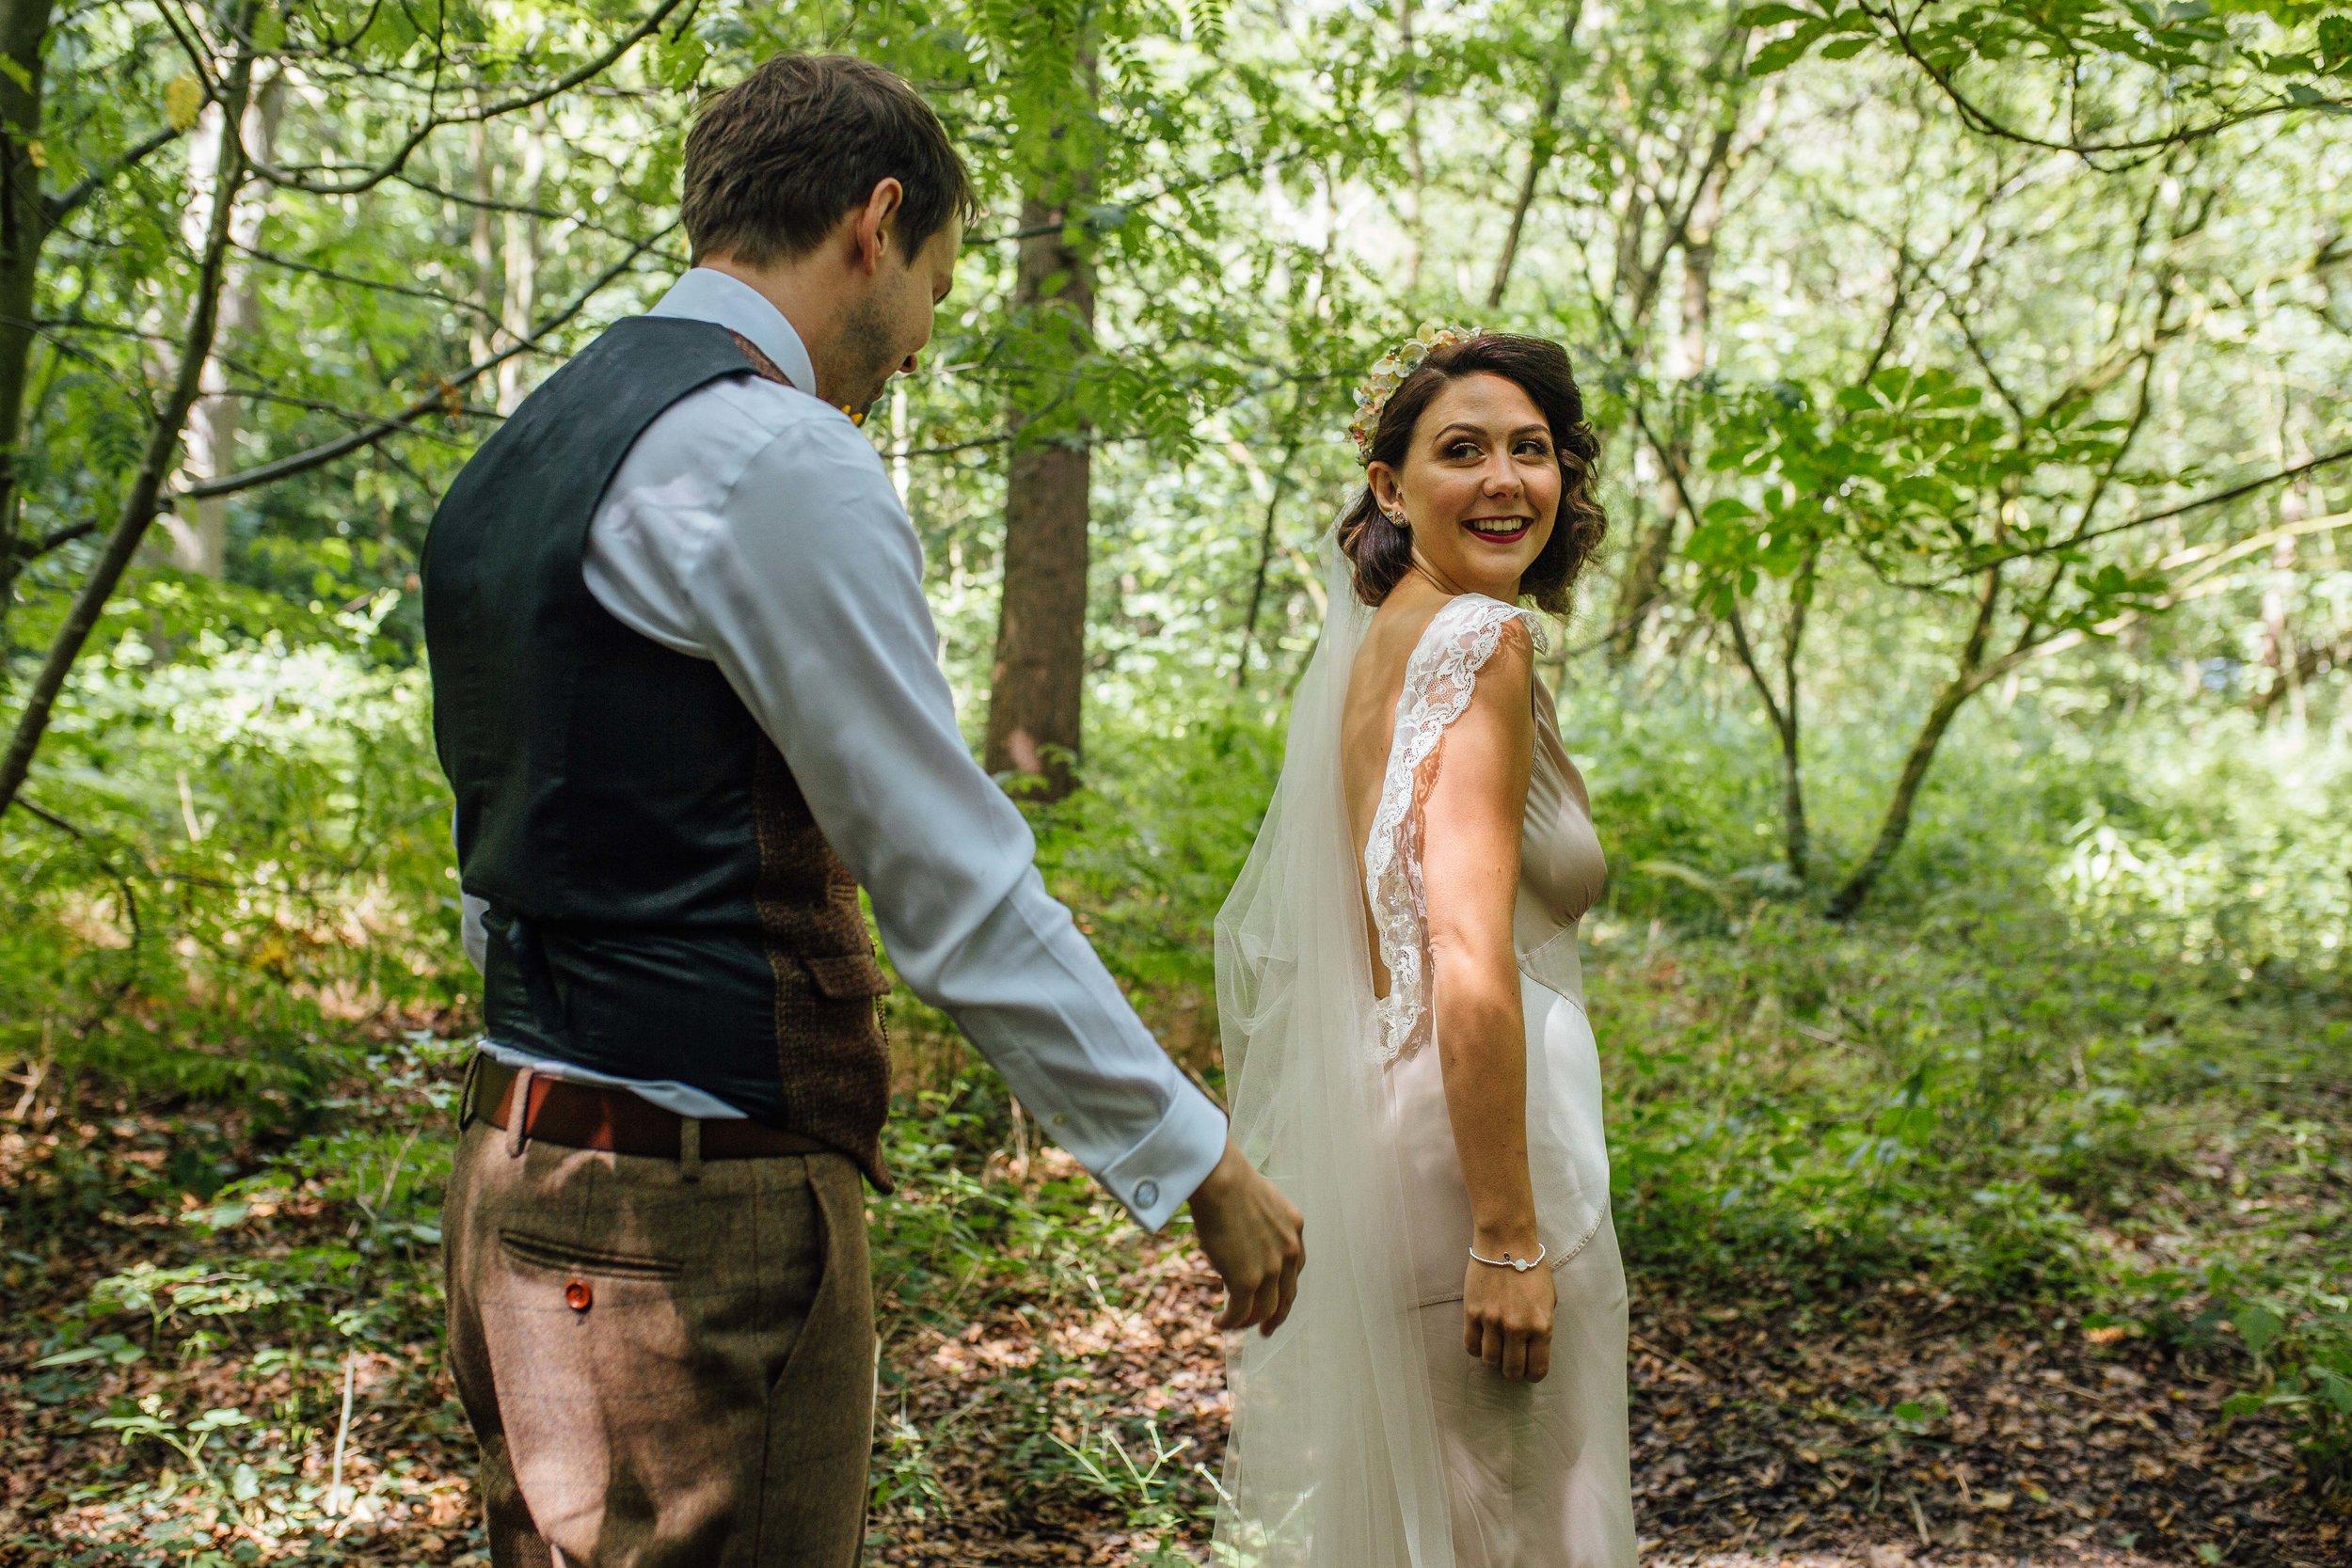 Katy-Bespoke-Veil-Sheffield-Wedding-Wes-Anderson-Susanna-Greening-Derbyshire-9